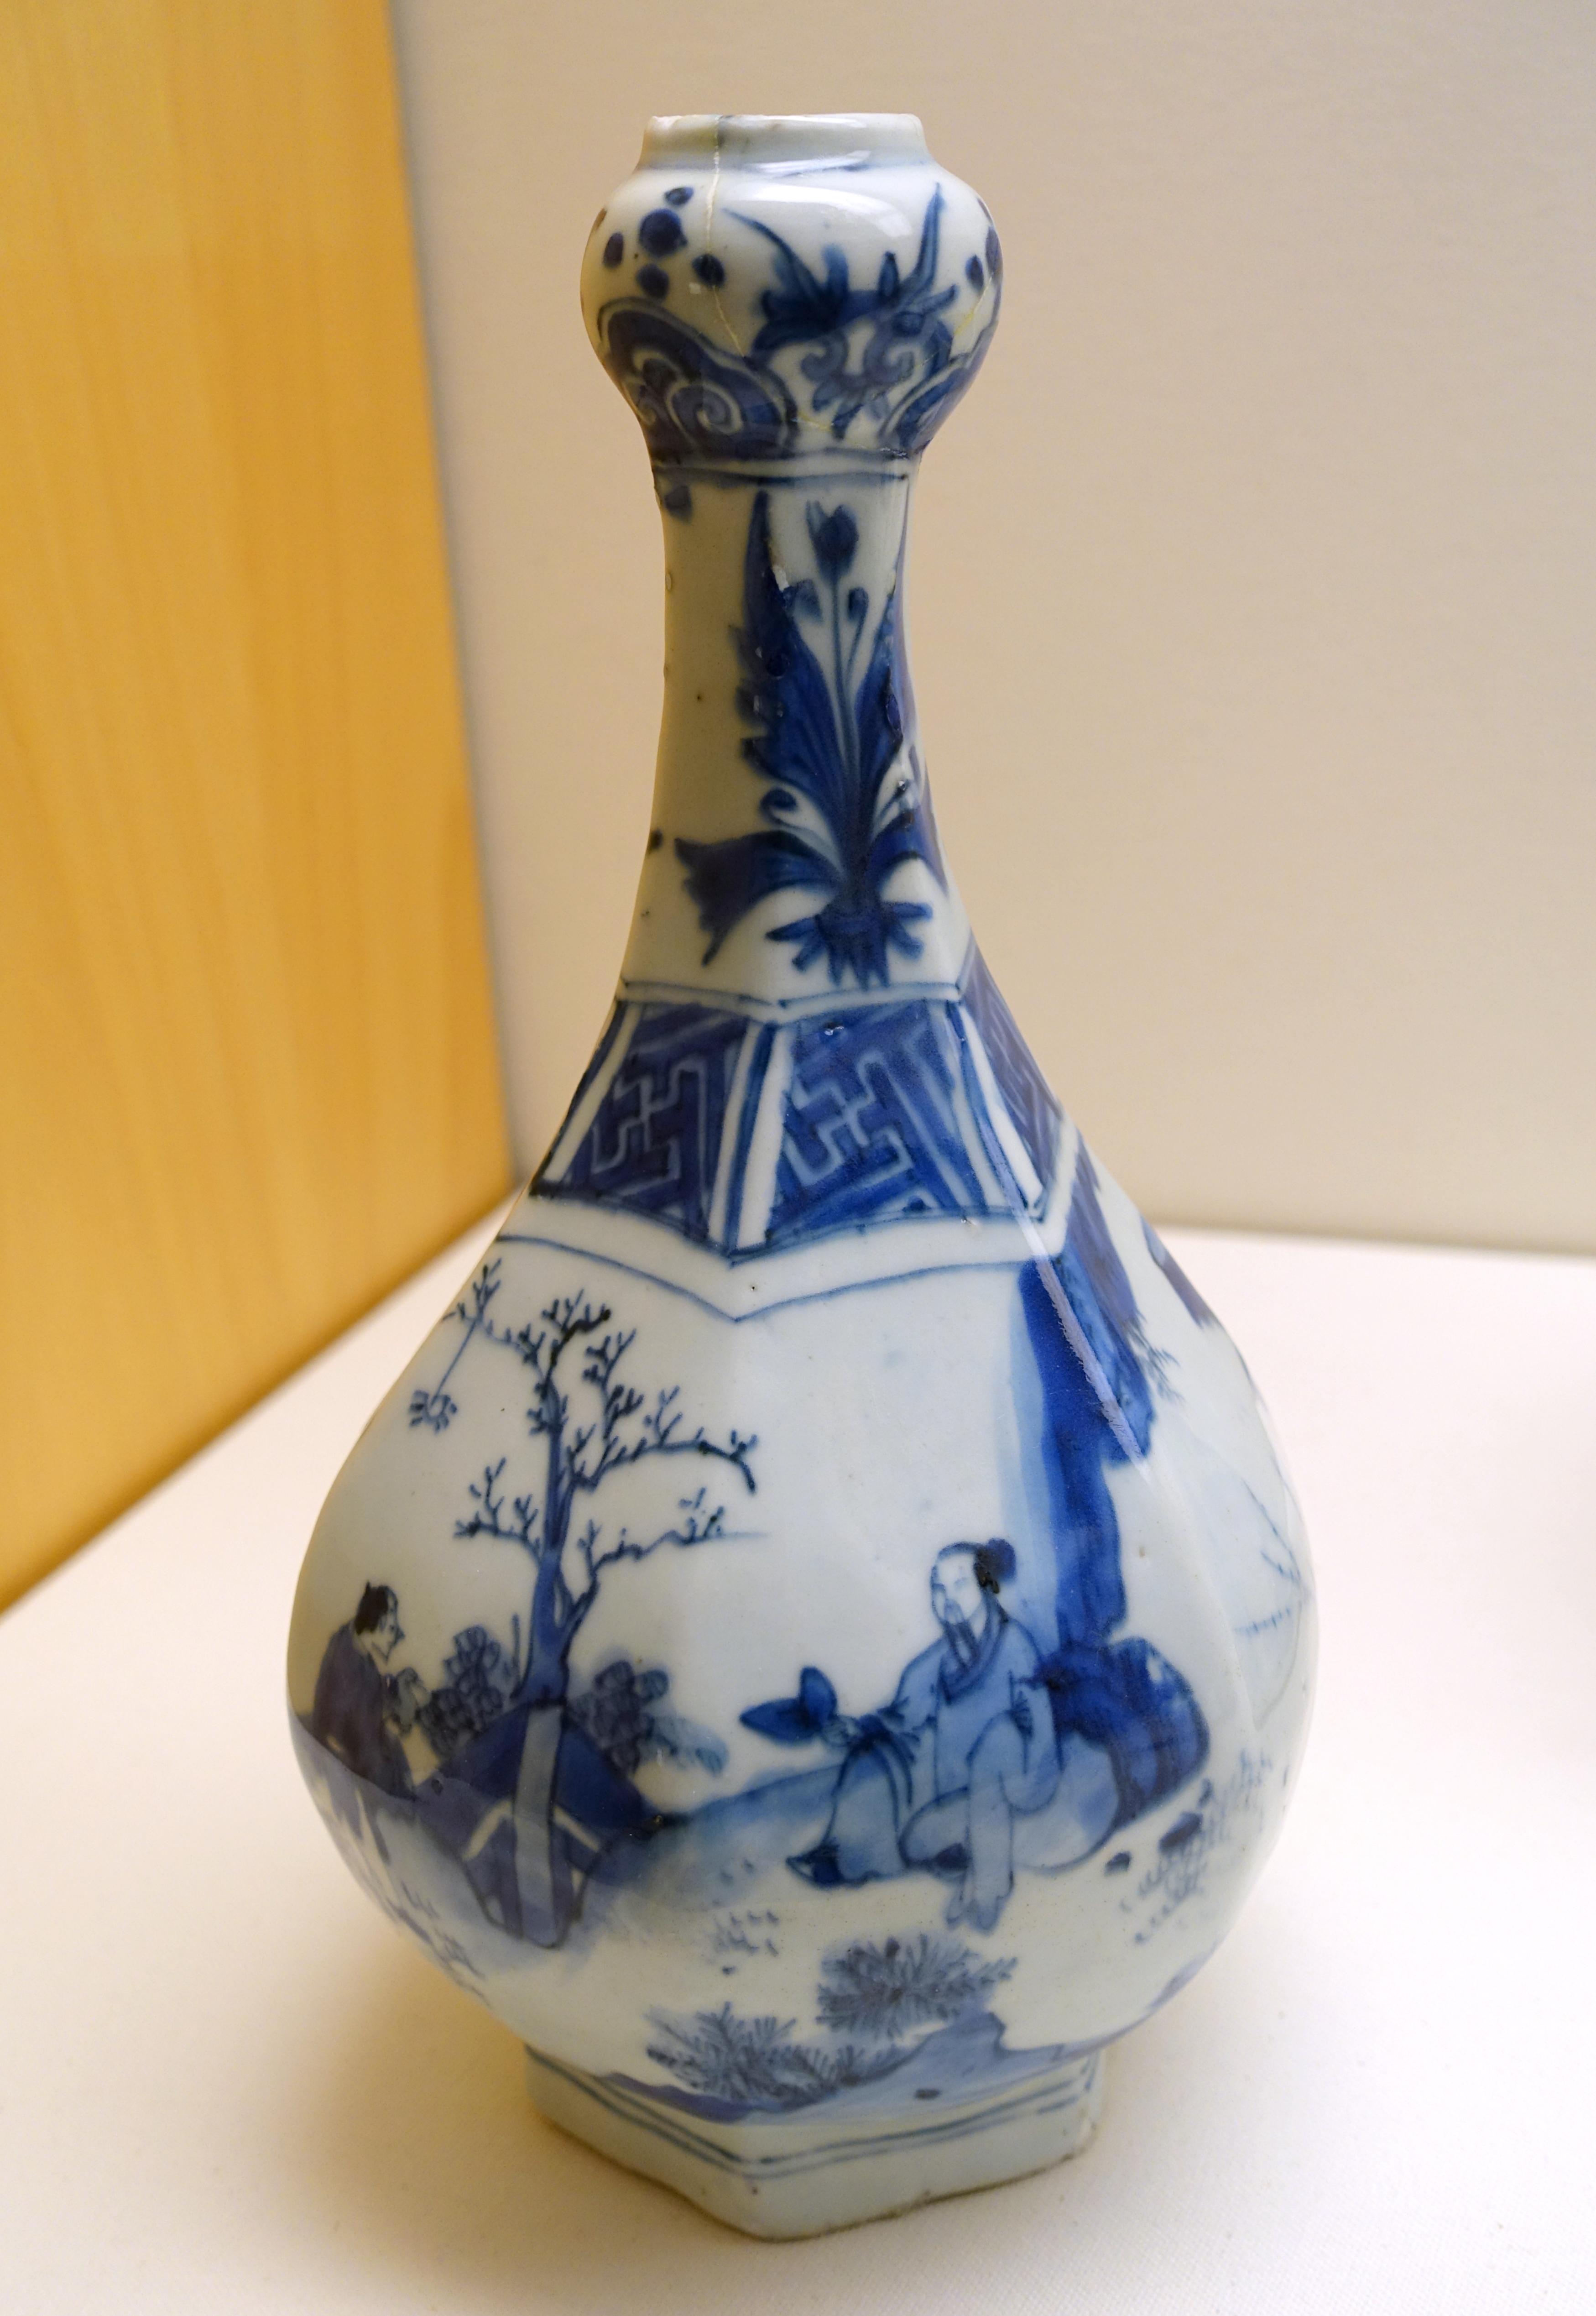 File:Hexagonal garlic-headed vase, China, transitional period, mid